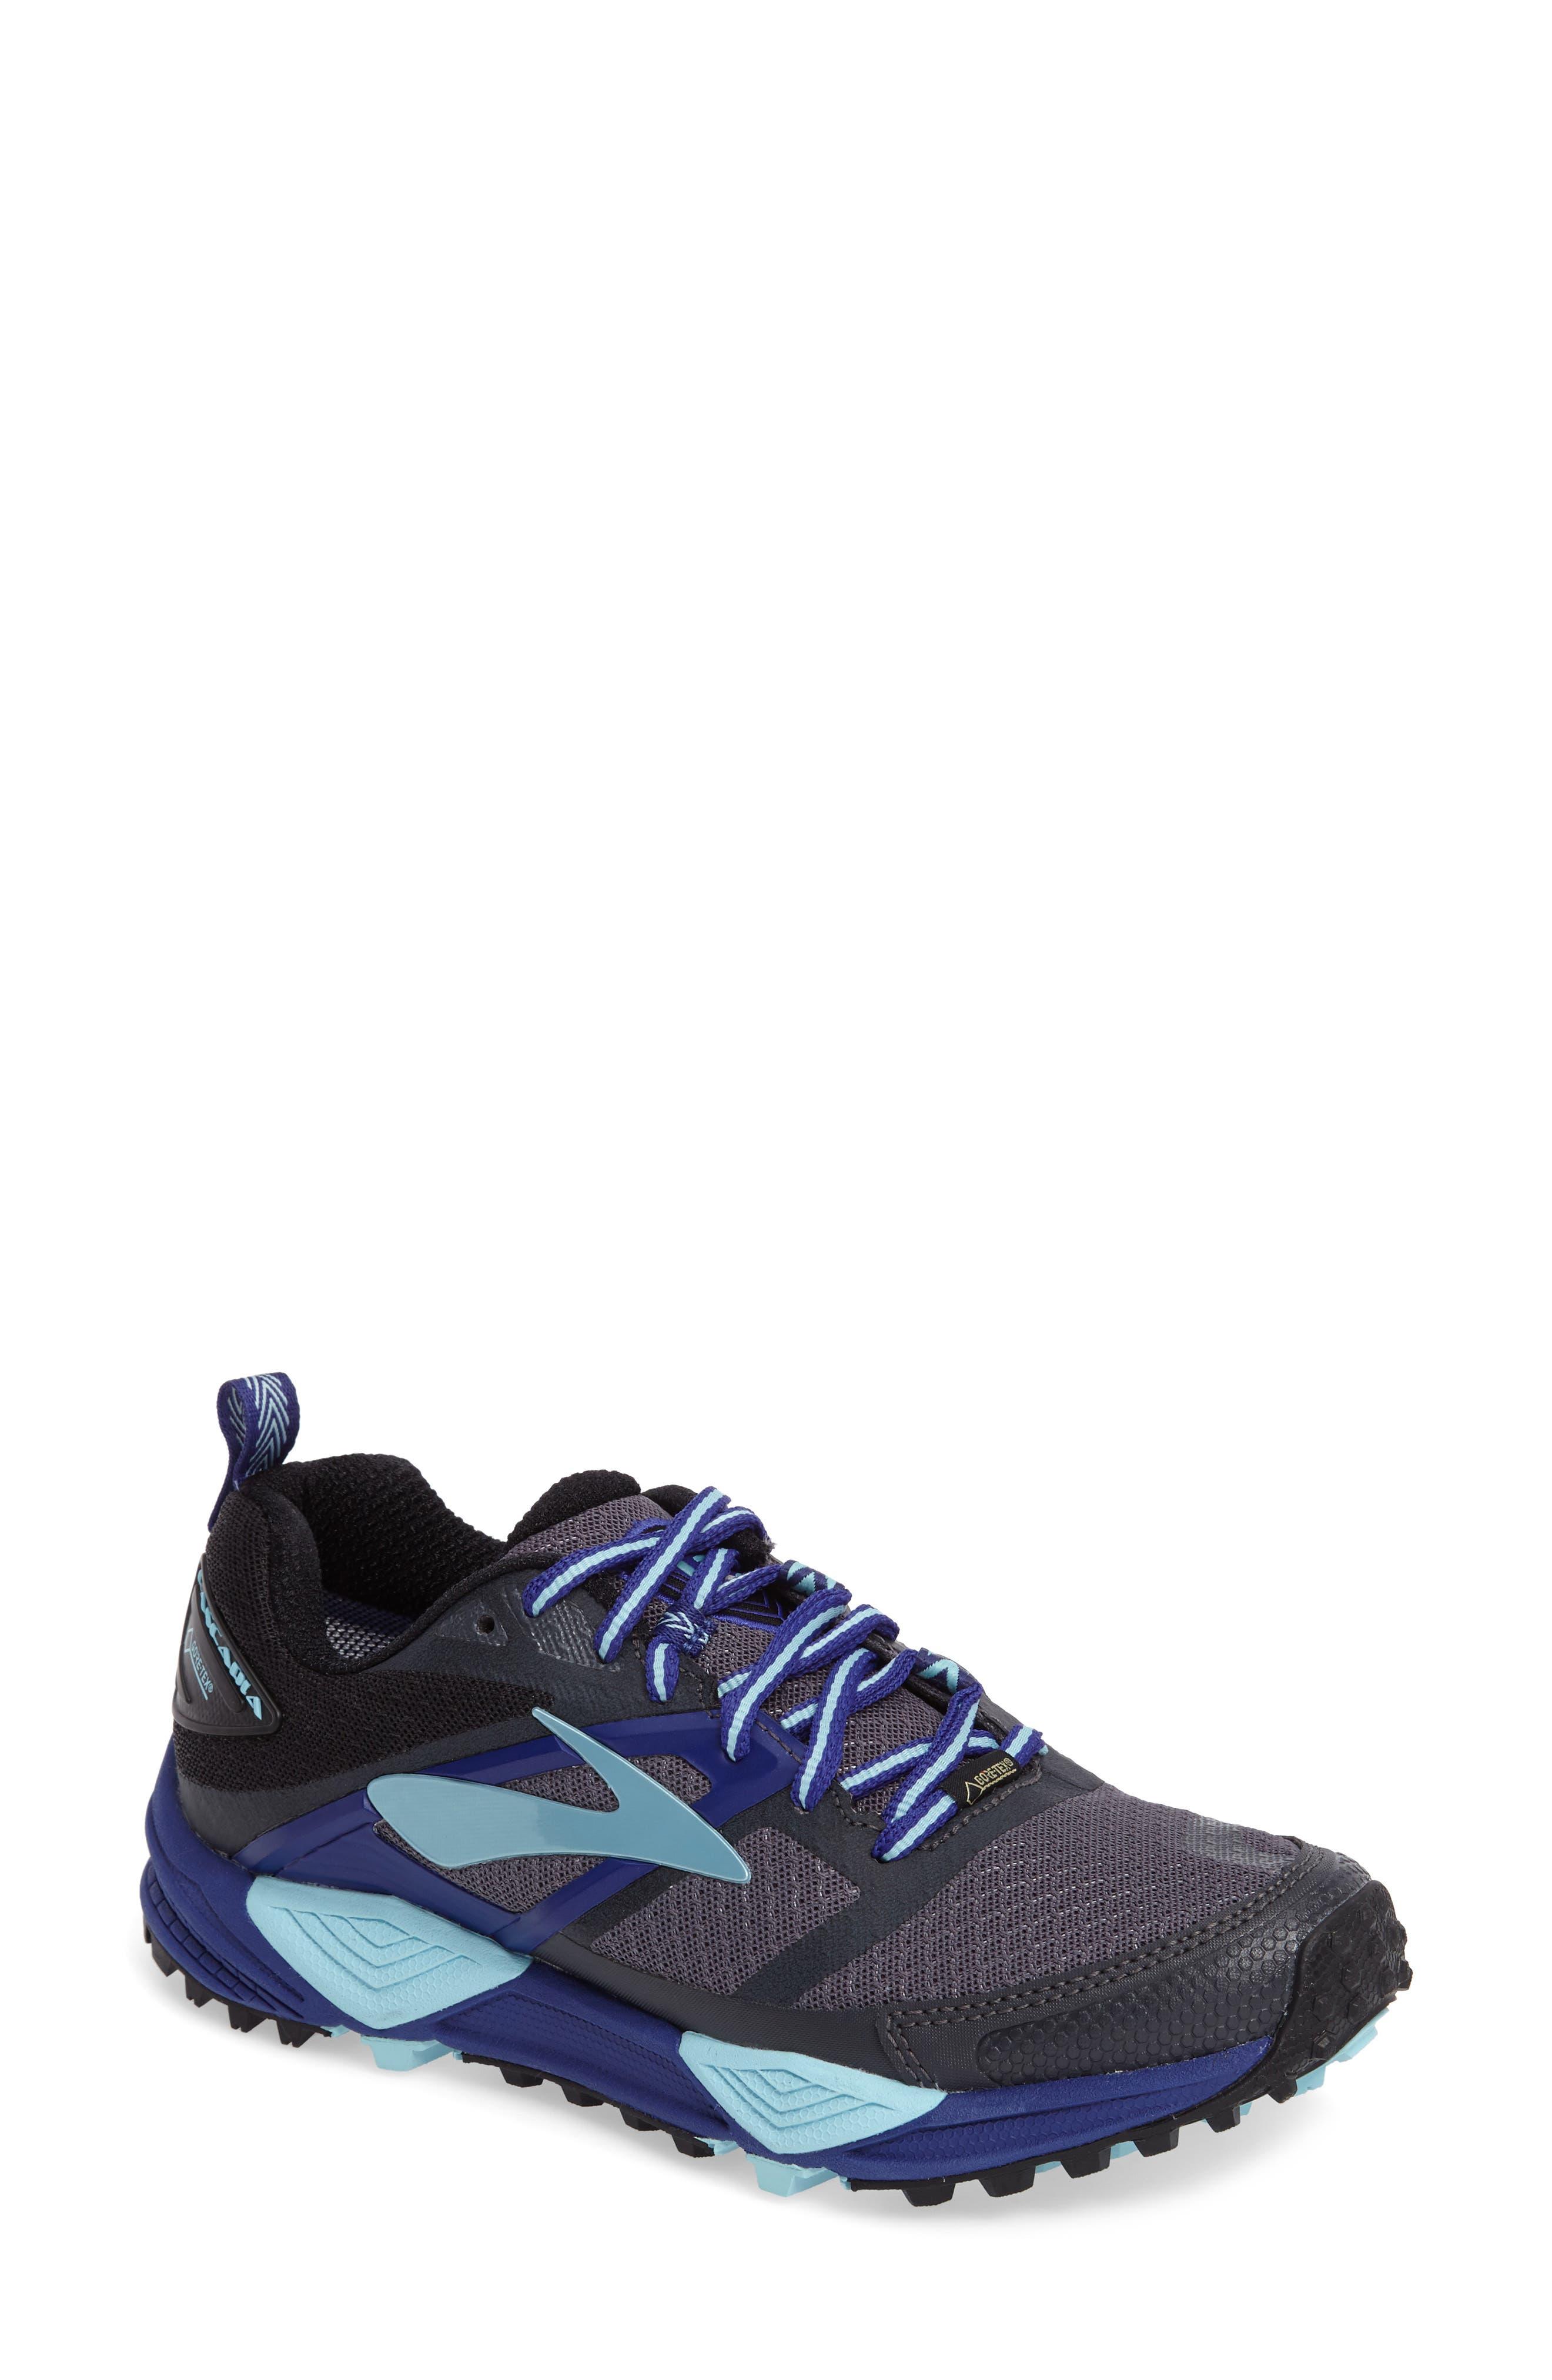 Cascadia 12 GTX Trail Running Shoe,                             Main thumbnail 1, color,                             Black/ Ebony/ Clematis Blue